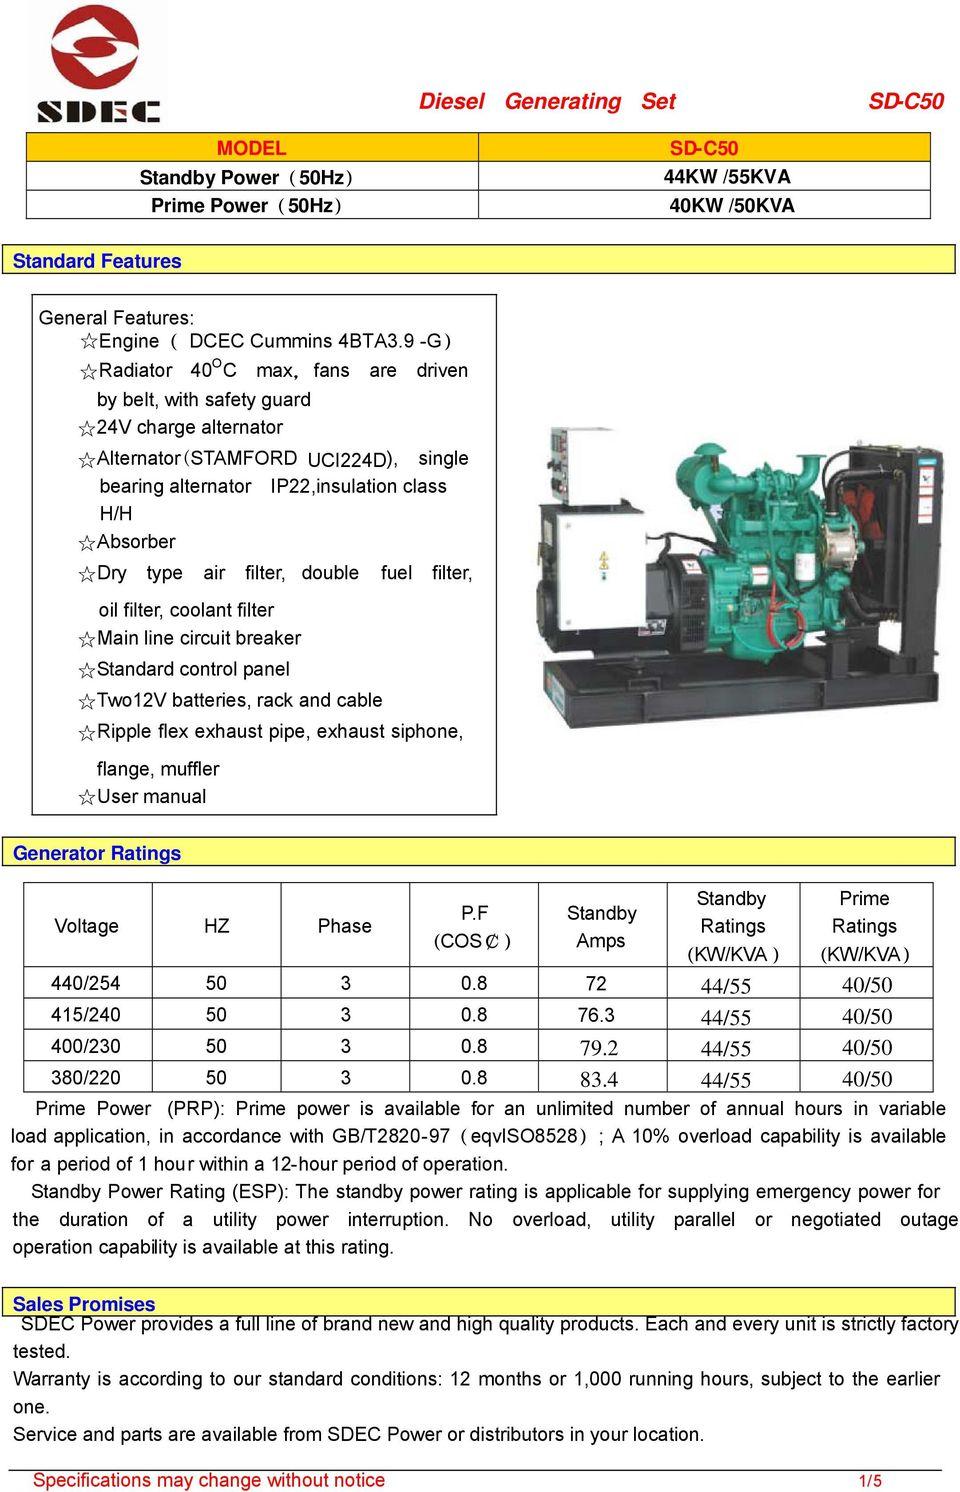 medium resolution of filter double fuel filter oil filter coolant filter main line circuit breaker standard